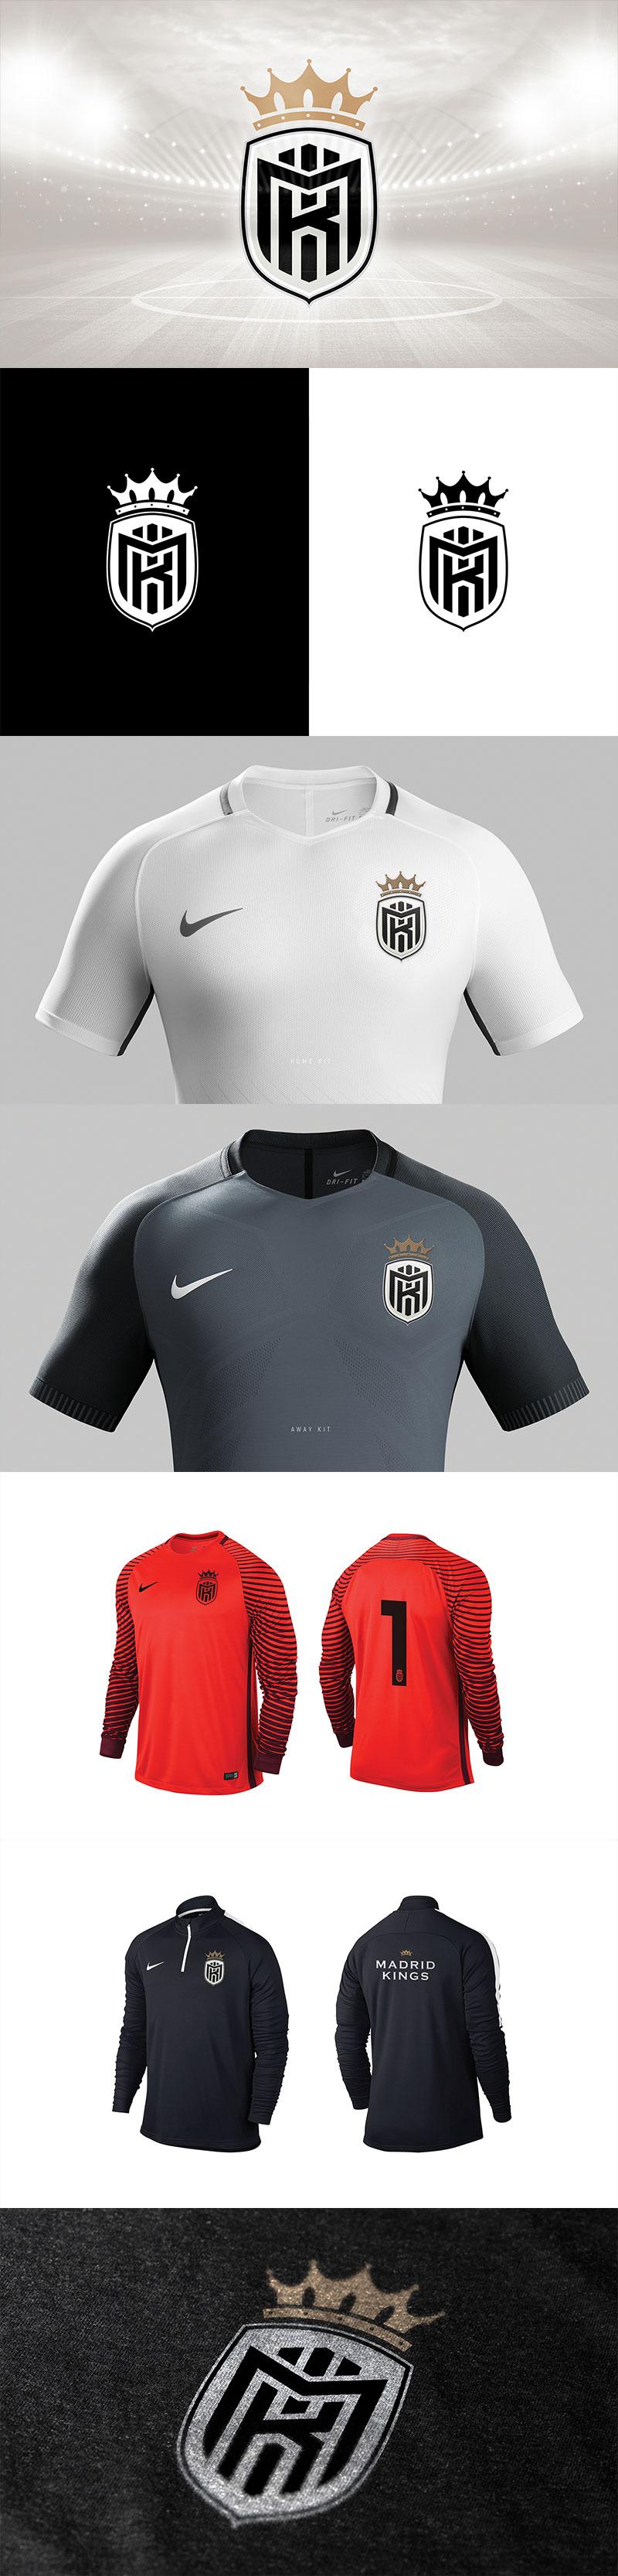 Diseños de la marca Football Club: Branding The Madrid Kingsby por Ricardo Carvalho